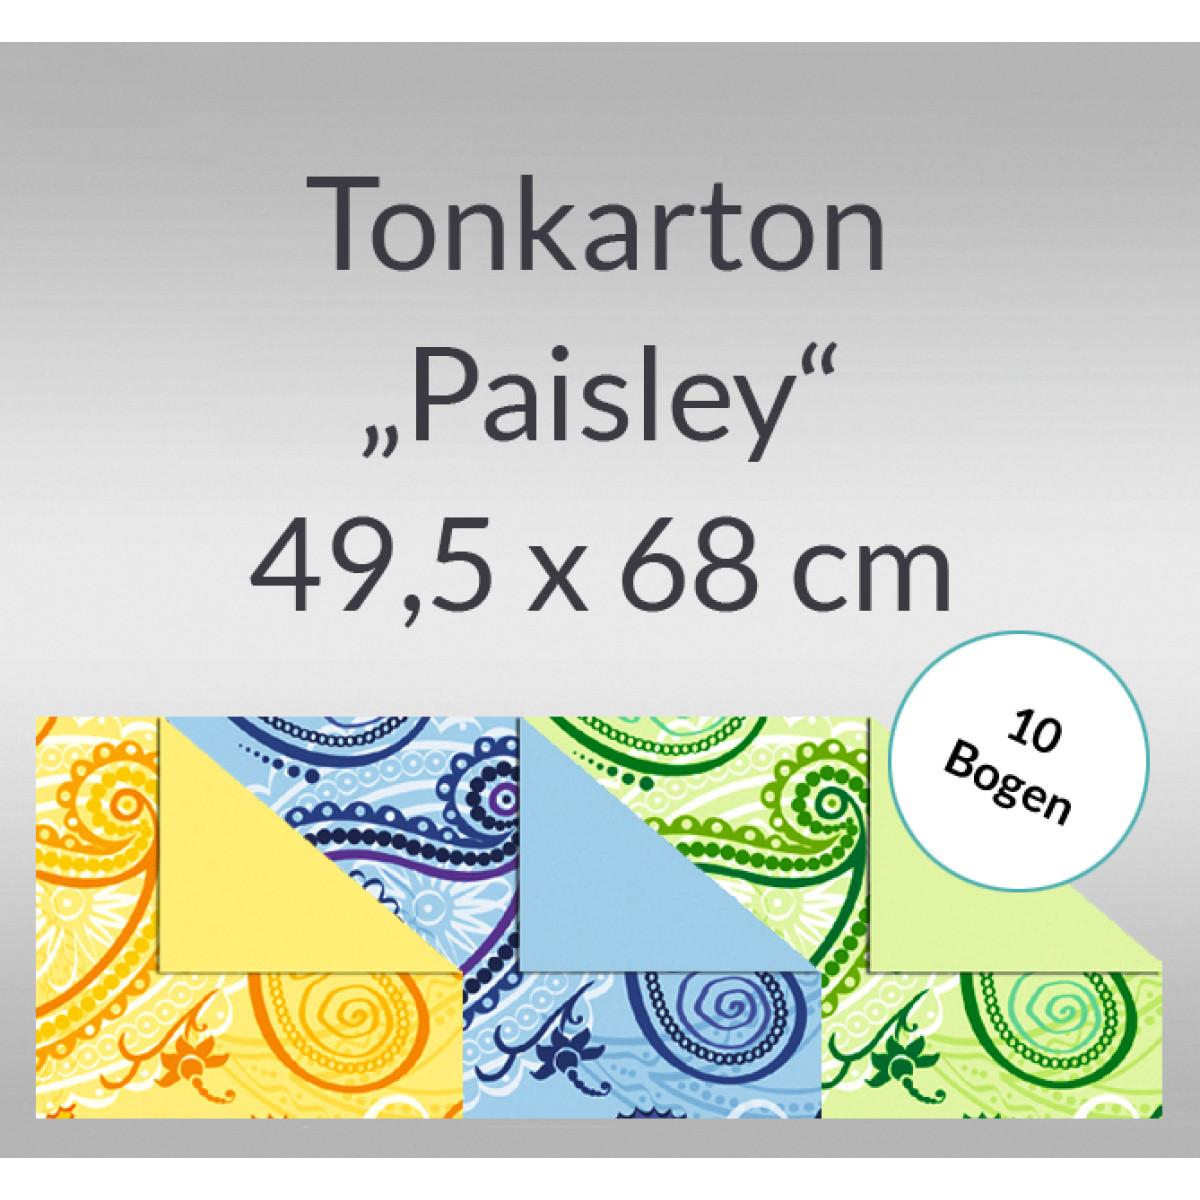 "Tonkarton ""Paisley"" 220 g/qm 49,5 x 68 cm - 10 Bogen"